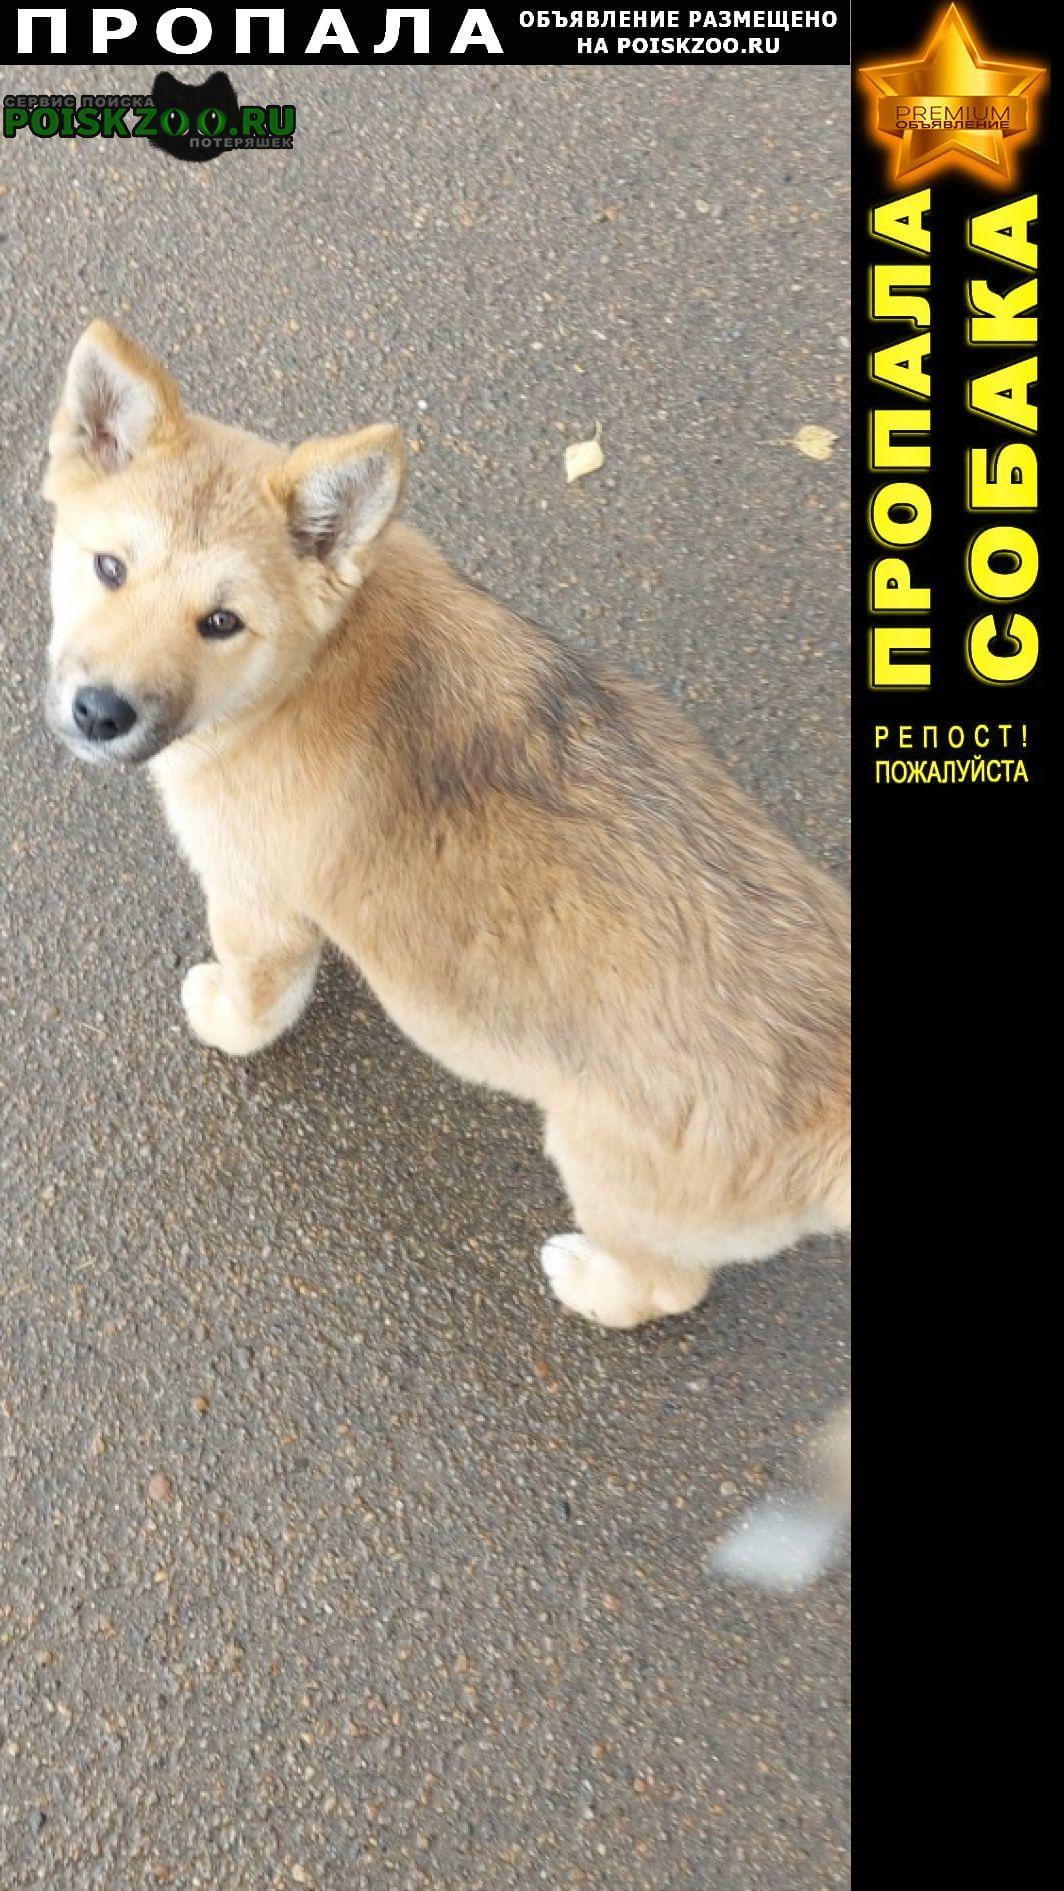 Пропала собака Ангарск